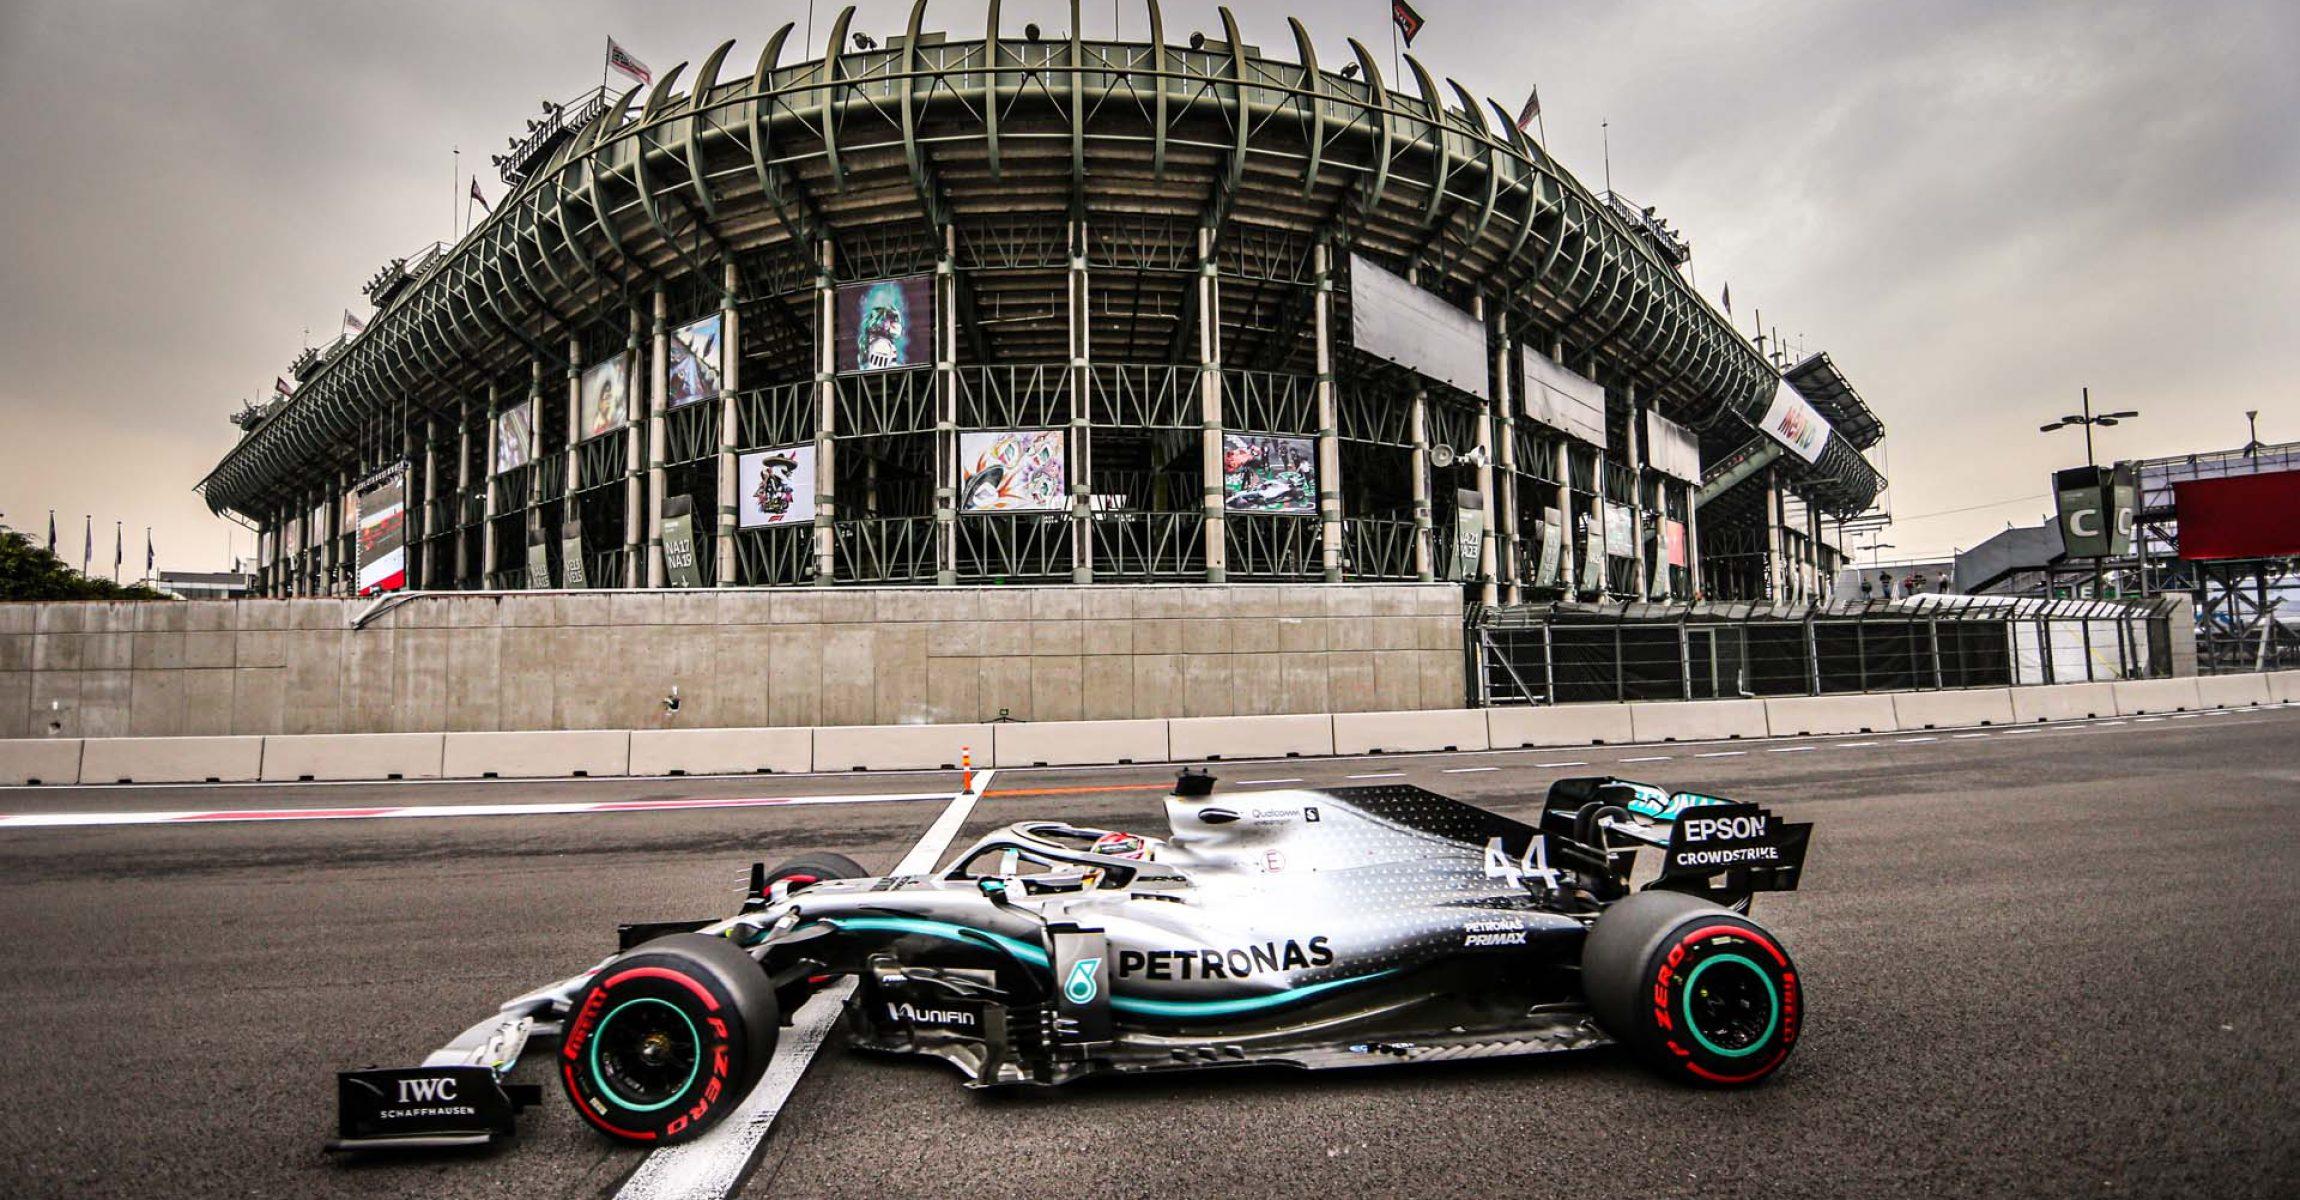 2019 Mexican Grand Prix, Saturday - Wolfgang Wilhelm Lewis Hamilton Mercedes